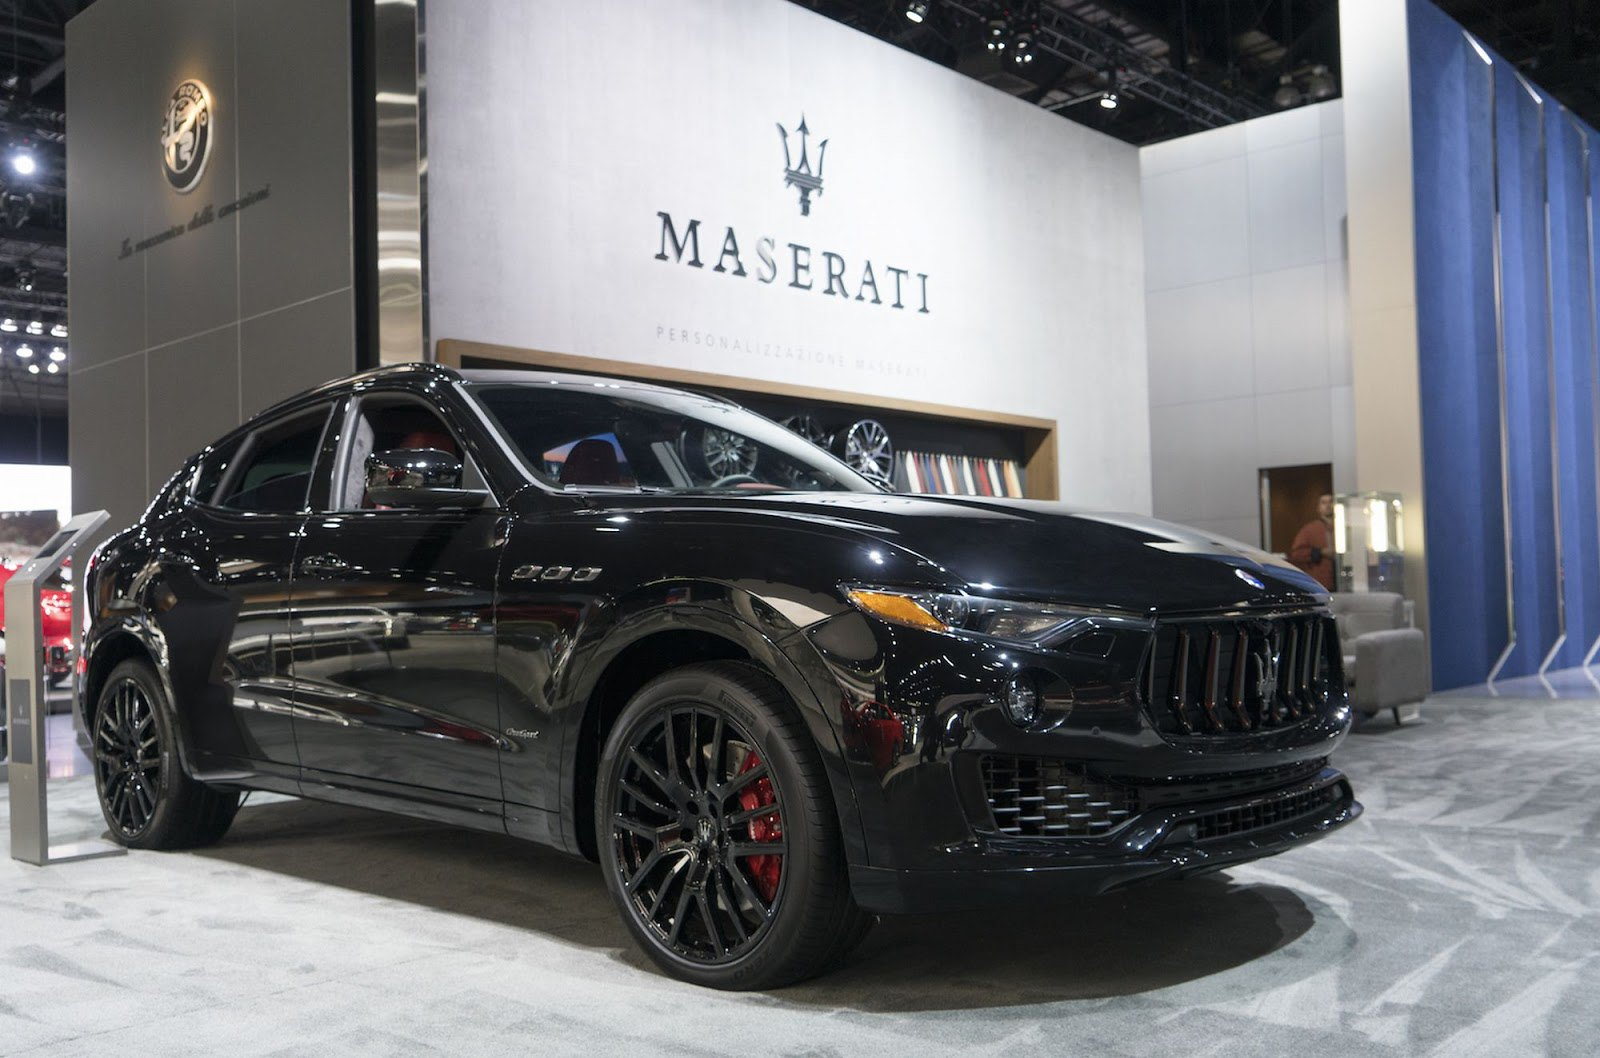 Towbin Ferrari Maserati New And Used Maserati Marserati Dealer In Las Vegas Nevada 89146